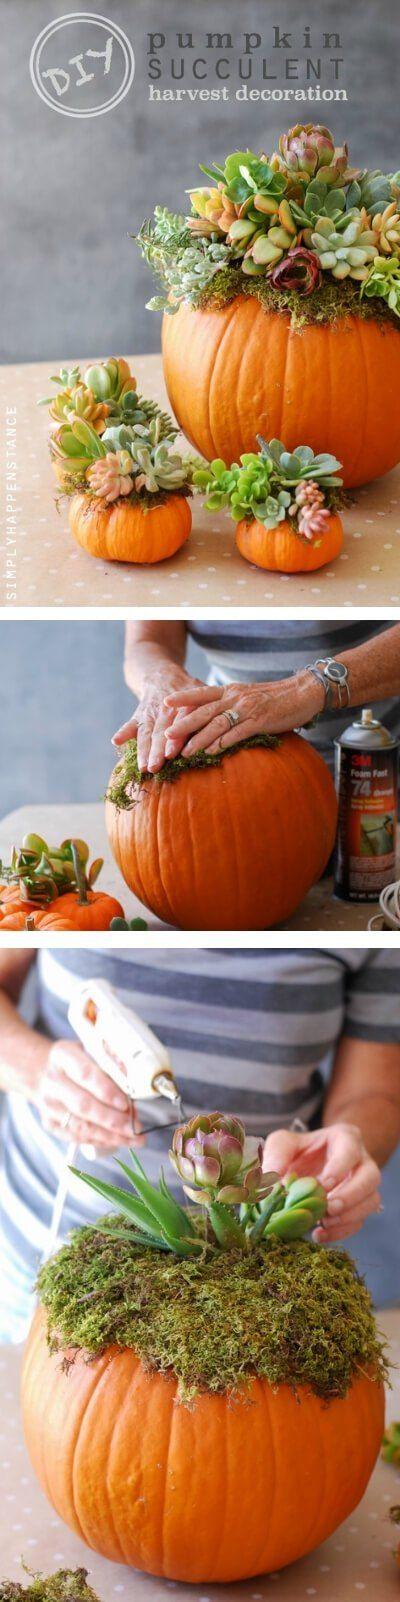 Pumpkin Succulent Harvest | Best DIY Fall Centerpiece Ideas | FarmFoodFamily.com